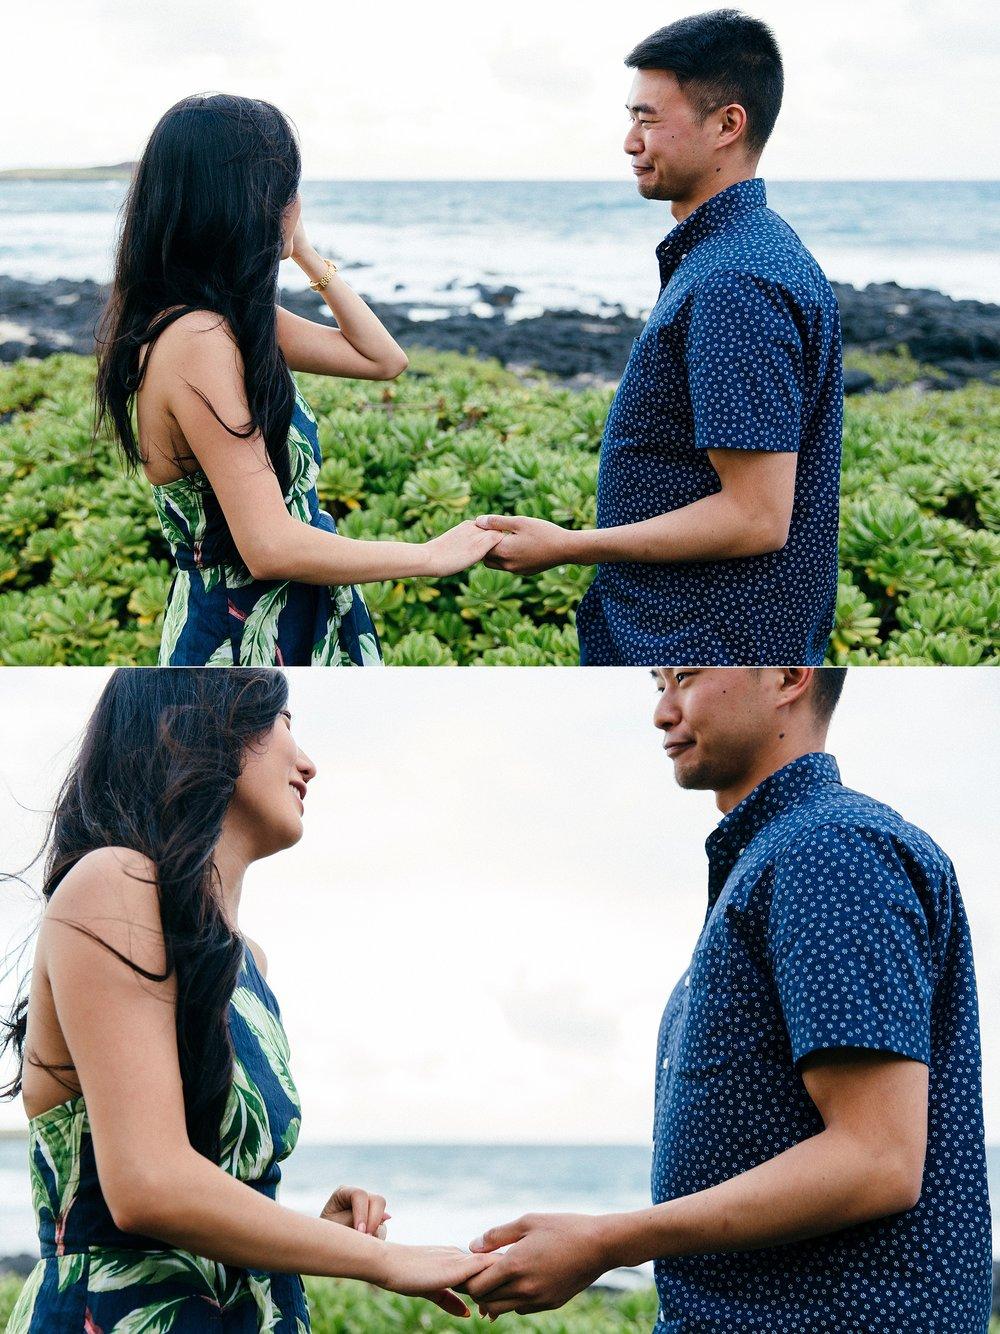 Hawaii Kai Proposal At Makapuu Lighthouse - Honolulu, Oahu Wedding Photographers